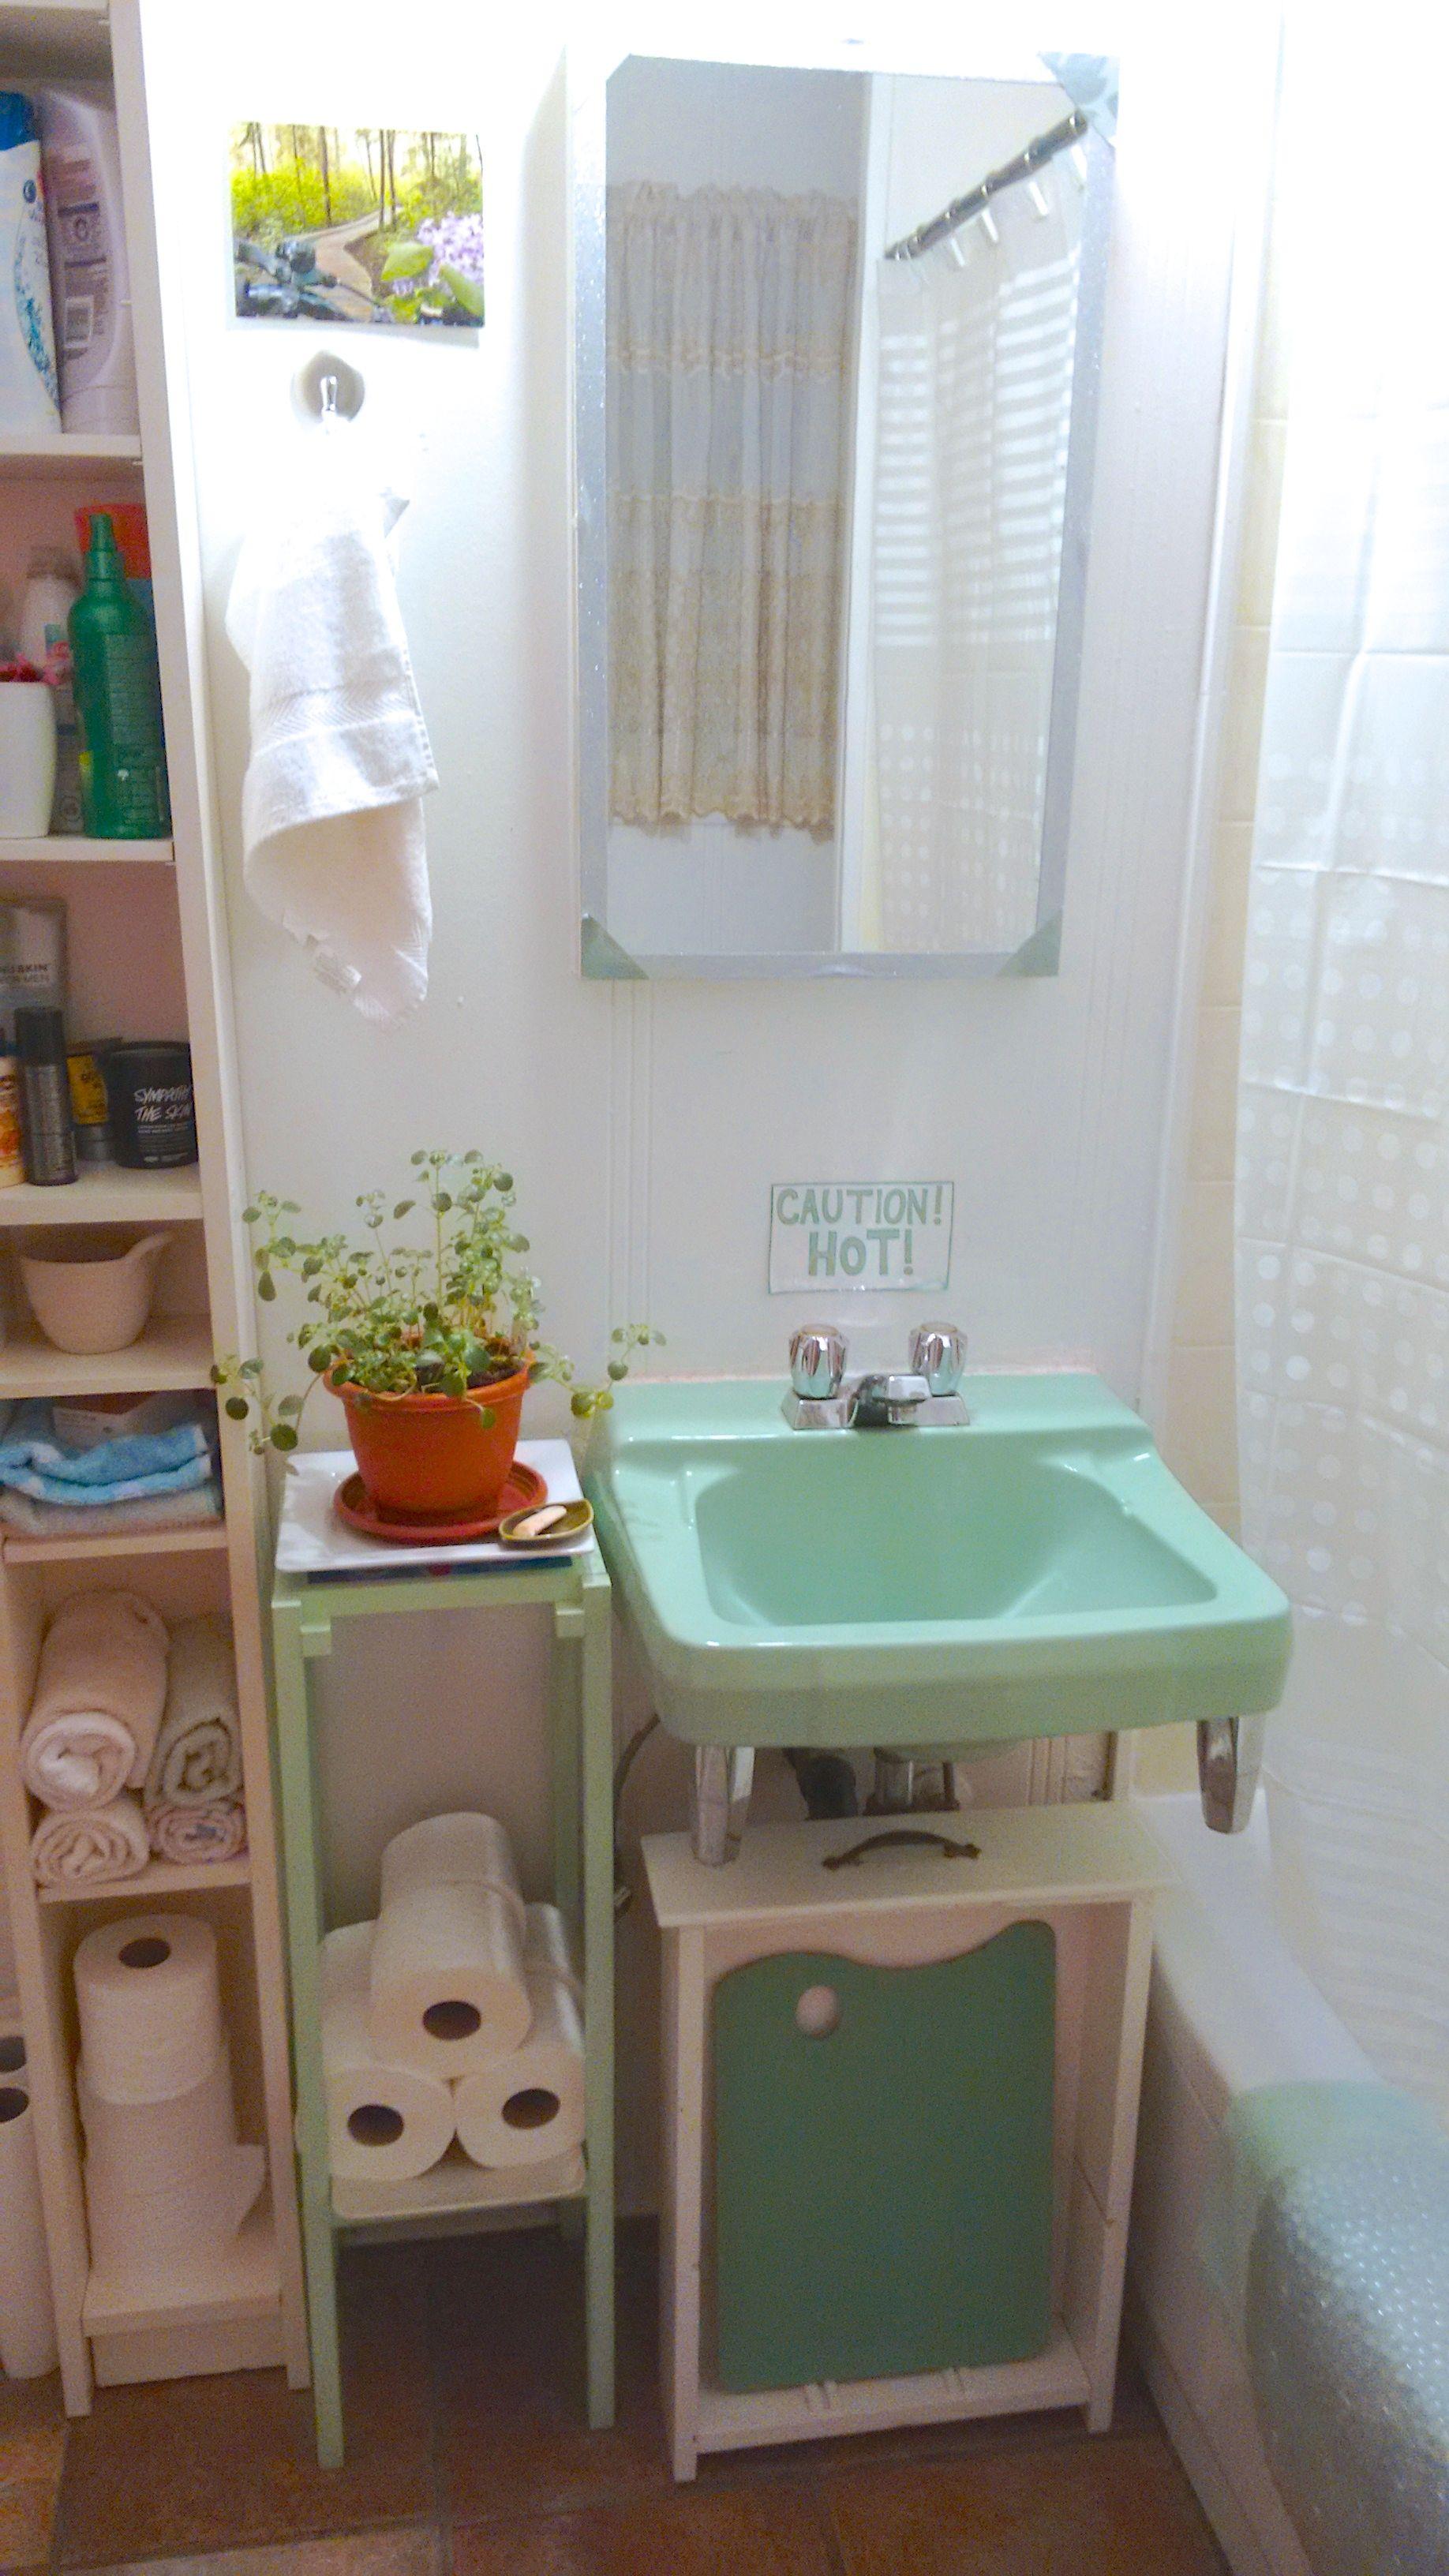 Because I Rent And My Income Are Limited I Had To Get Creative When Hiding The Bathroom Sink Pipes Ideias De Decoracao Casa Banheiros Antigos Moveis De Paletes